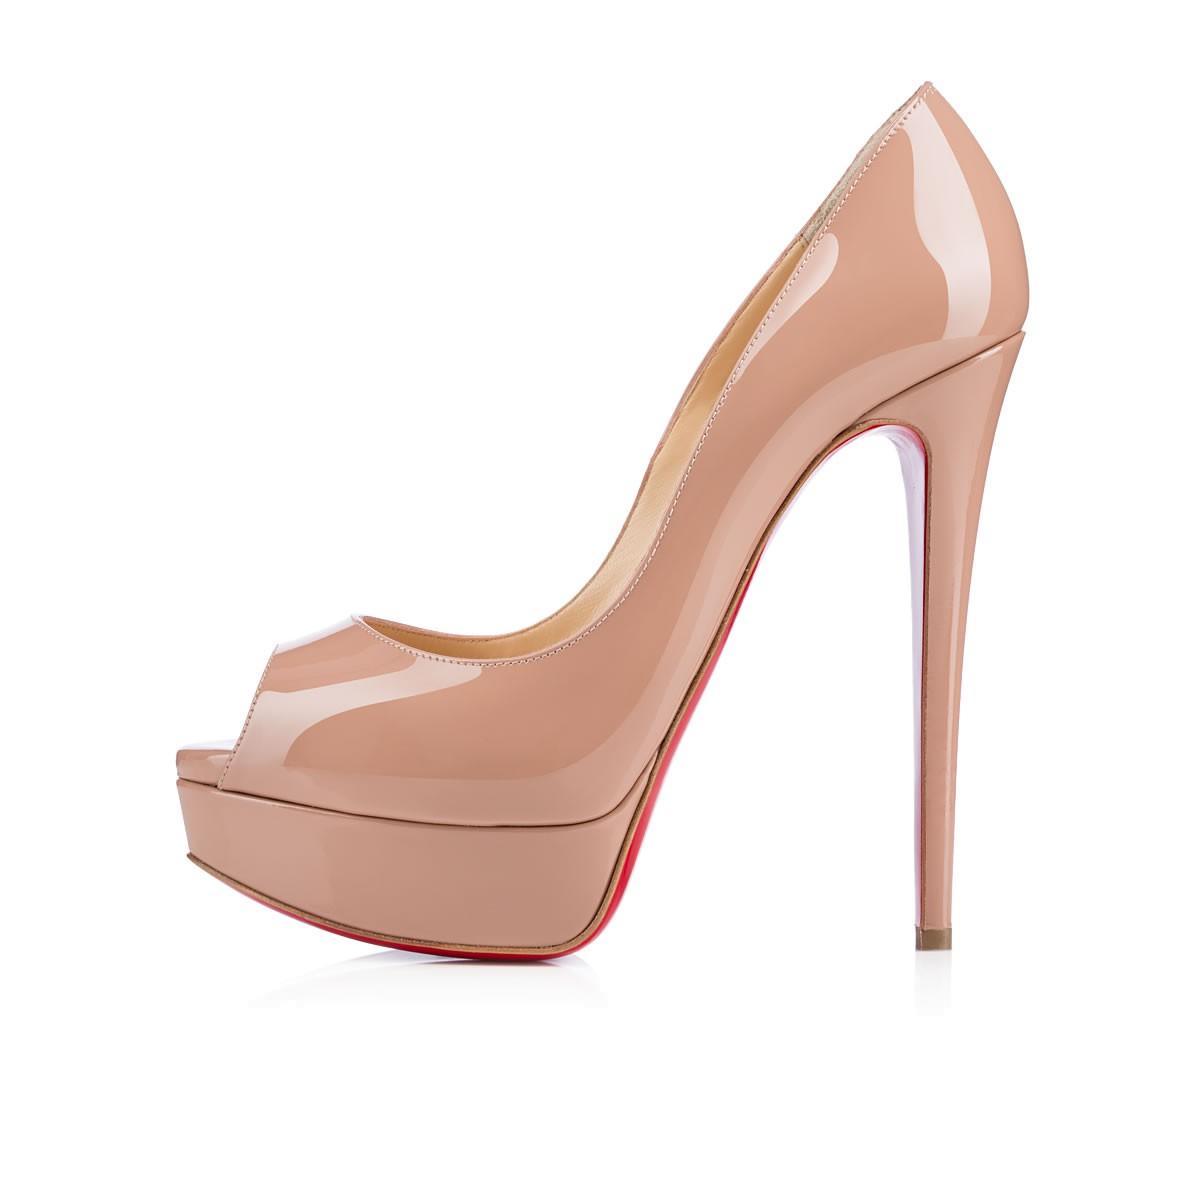 Christian Loub | Christian Louboutin Sale Shoes | Christian Louboutin Bianca